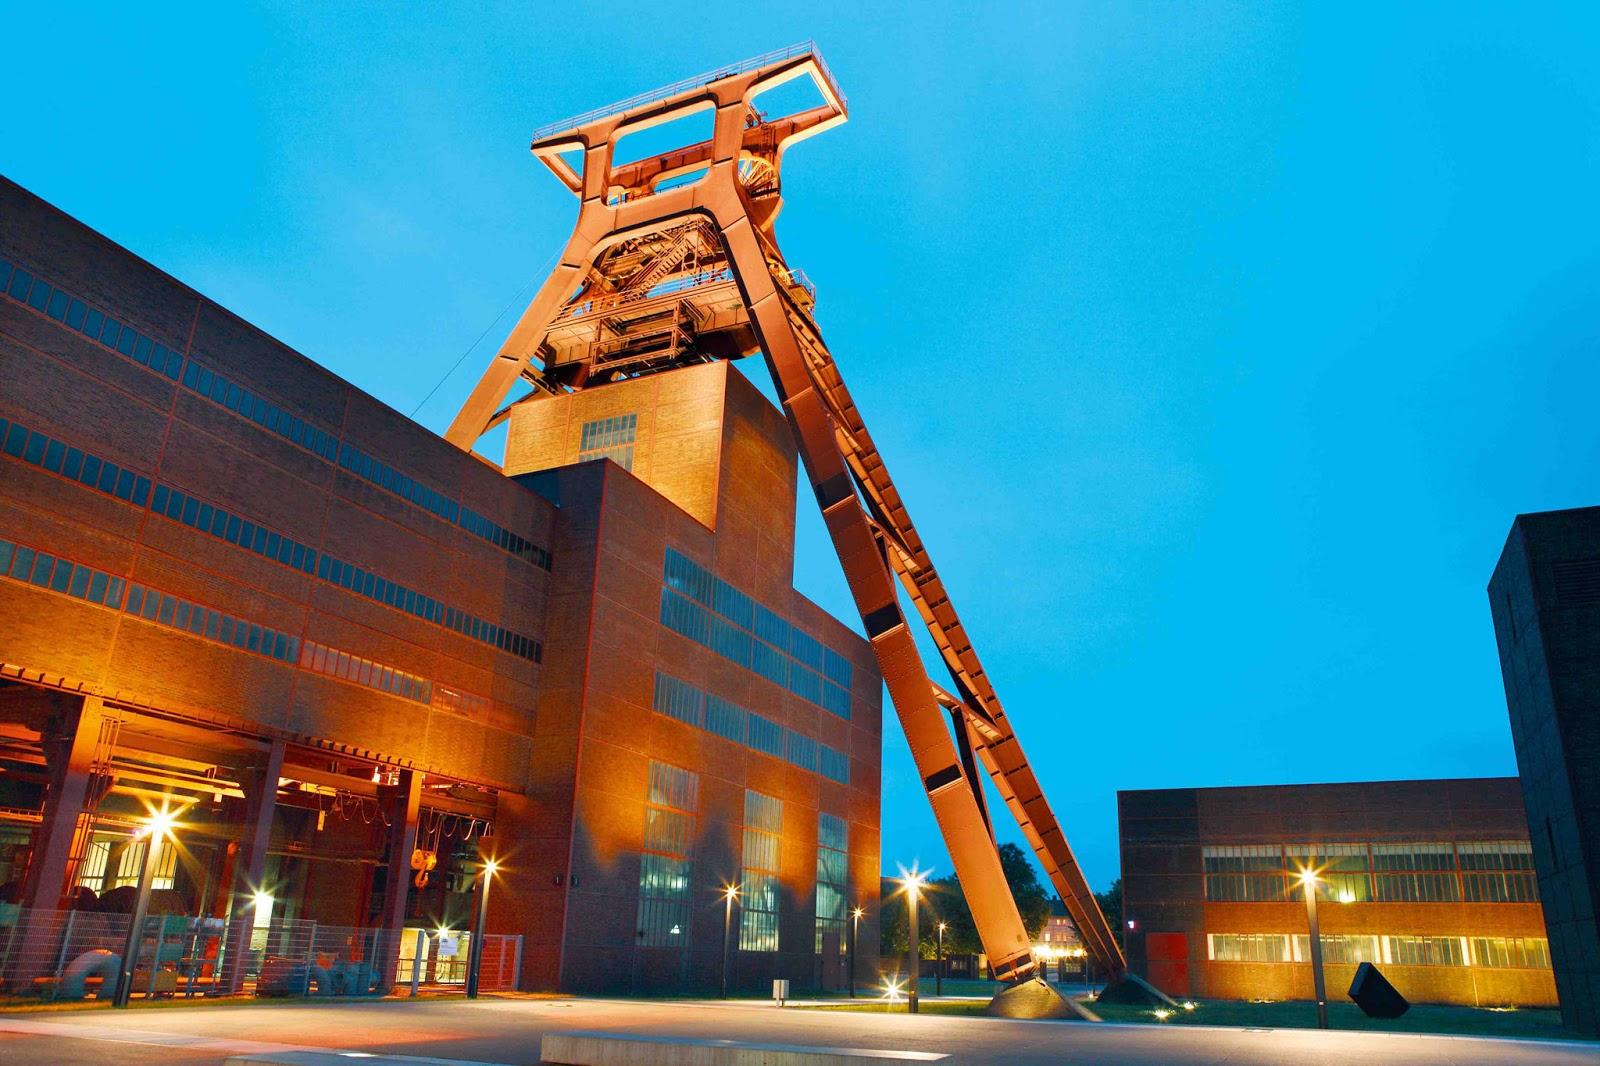 Zollverein Coal Mine Industrial Complex in Essen Germany   Traveling Tour  Guide